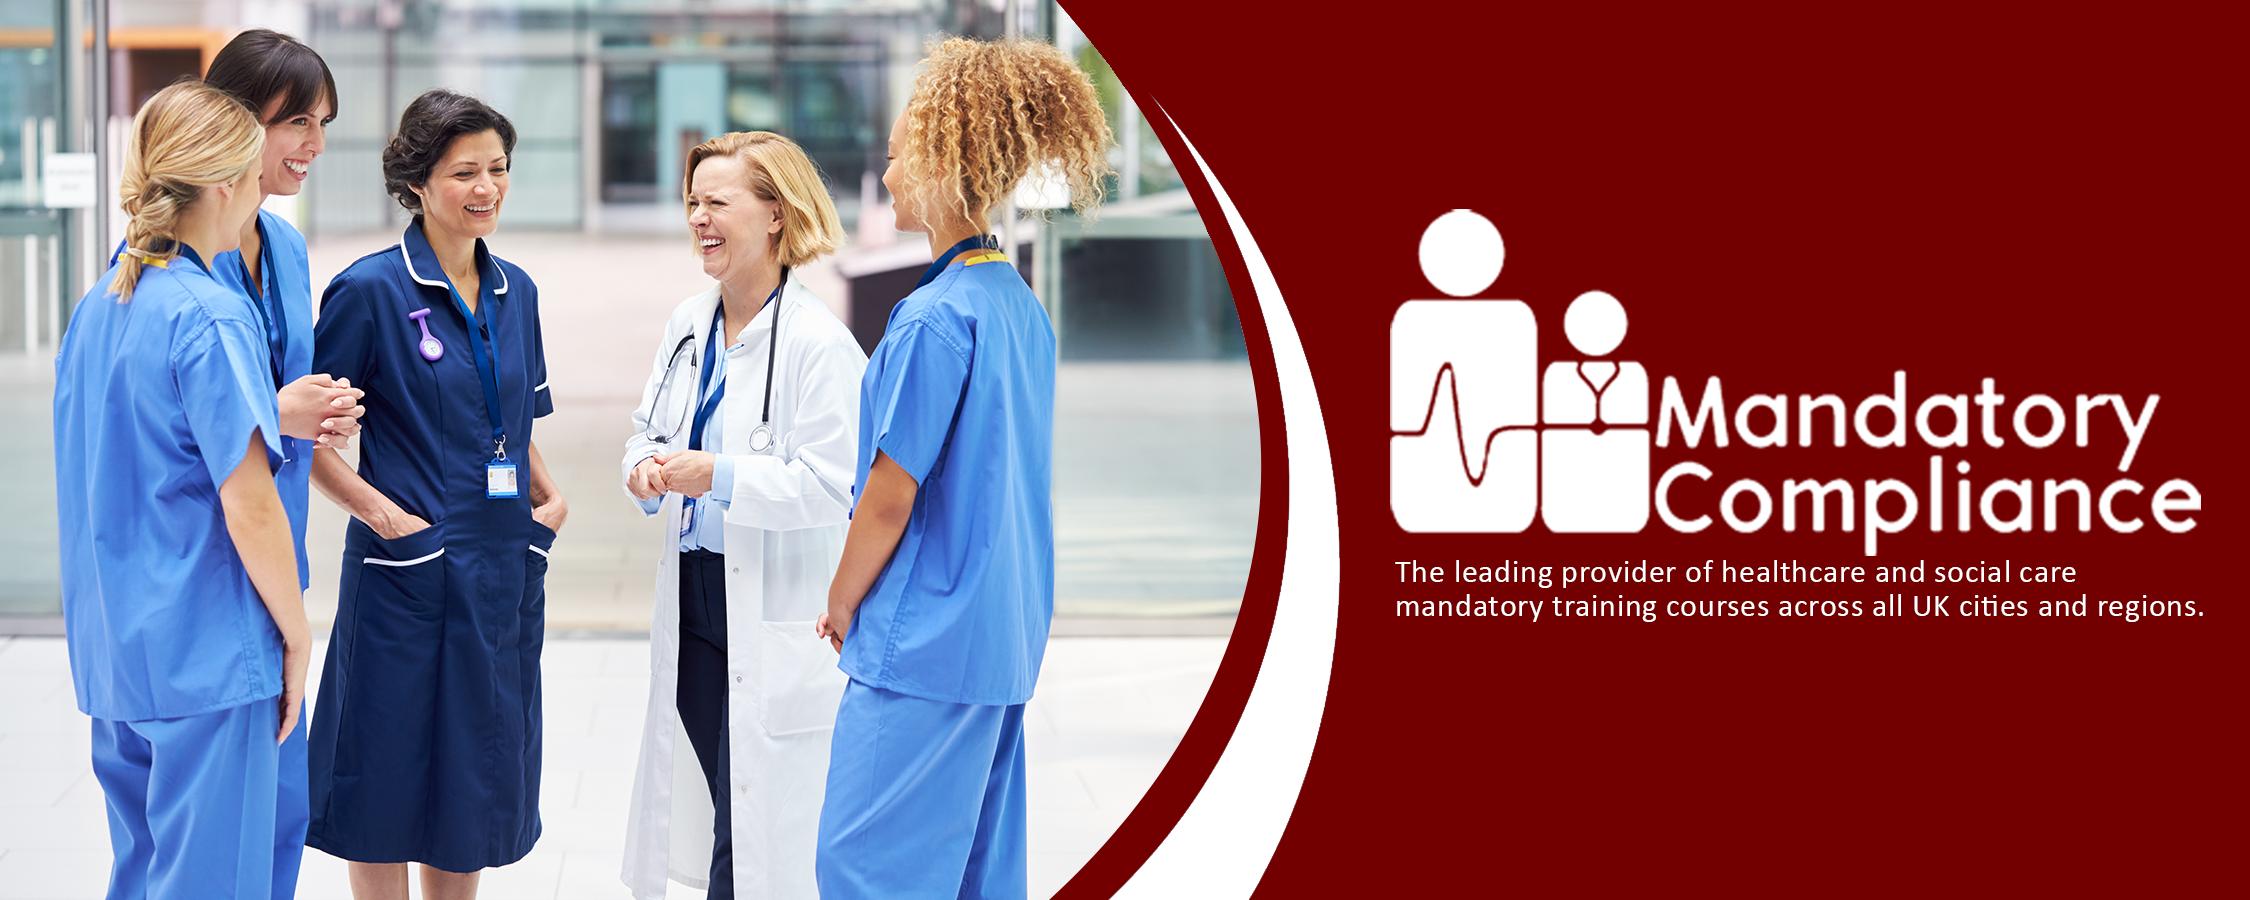 Recruitment Essentials - E-Learning-Courses-Mandatory-Compliance-UK-